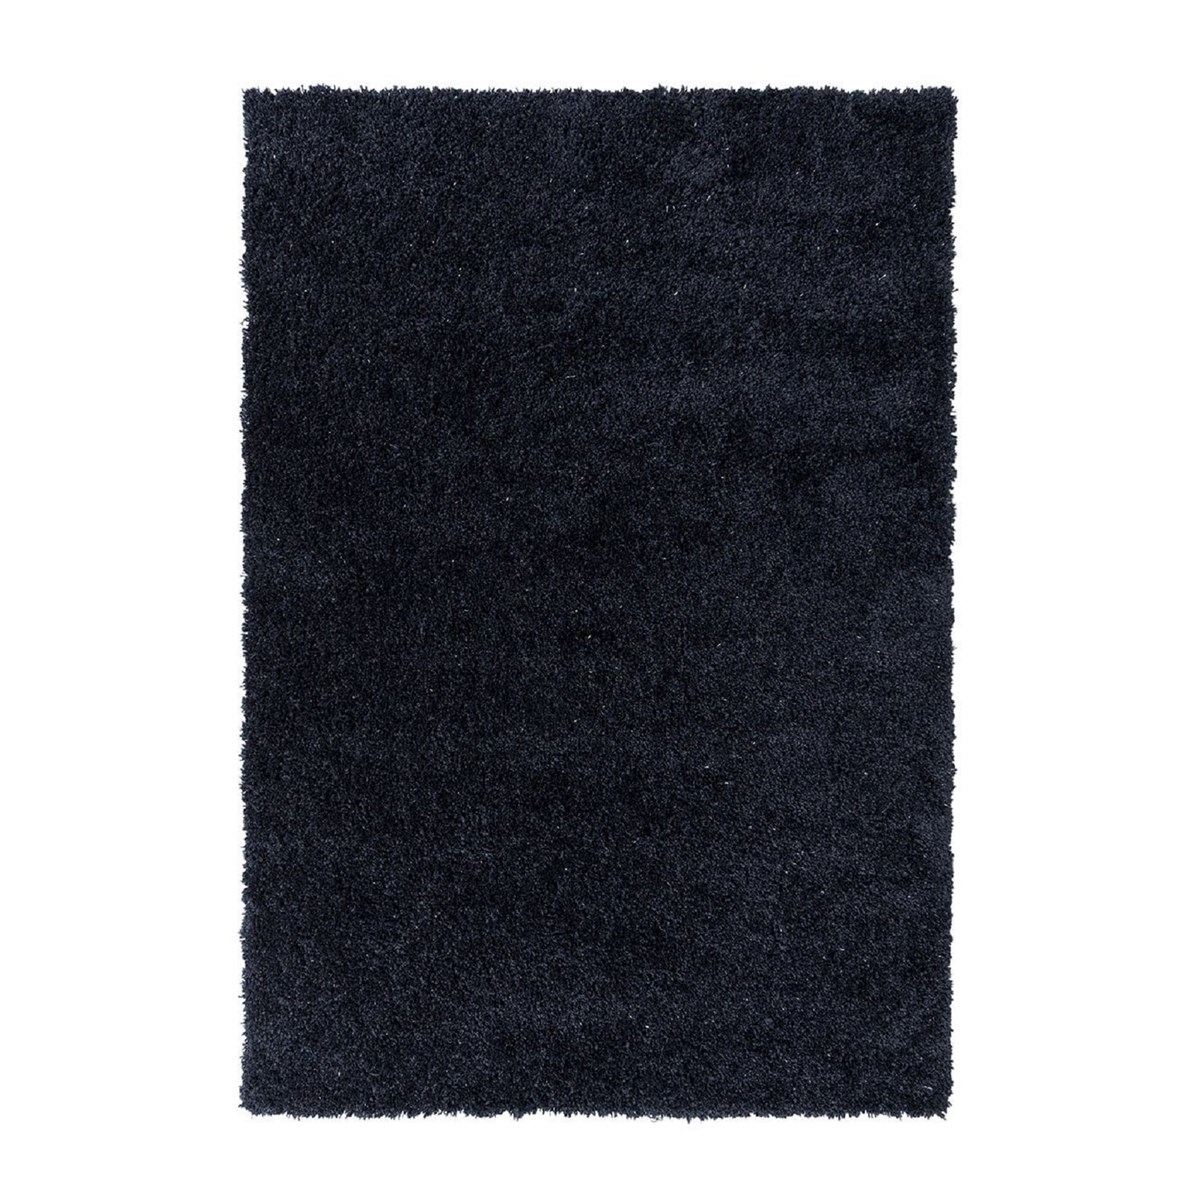 Tapis shaggy en Polyester Bleu nuit 160x230 cm